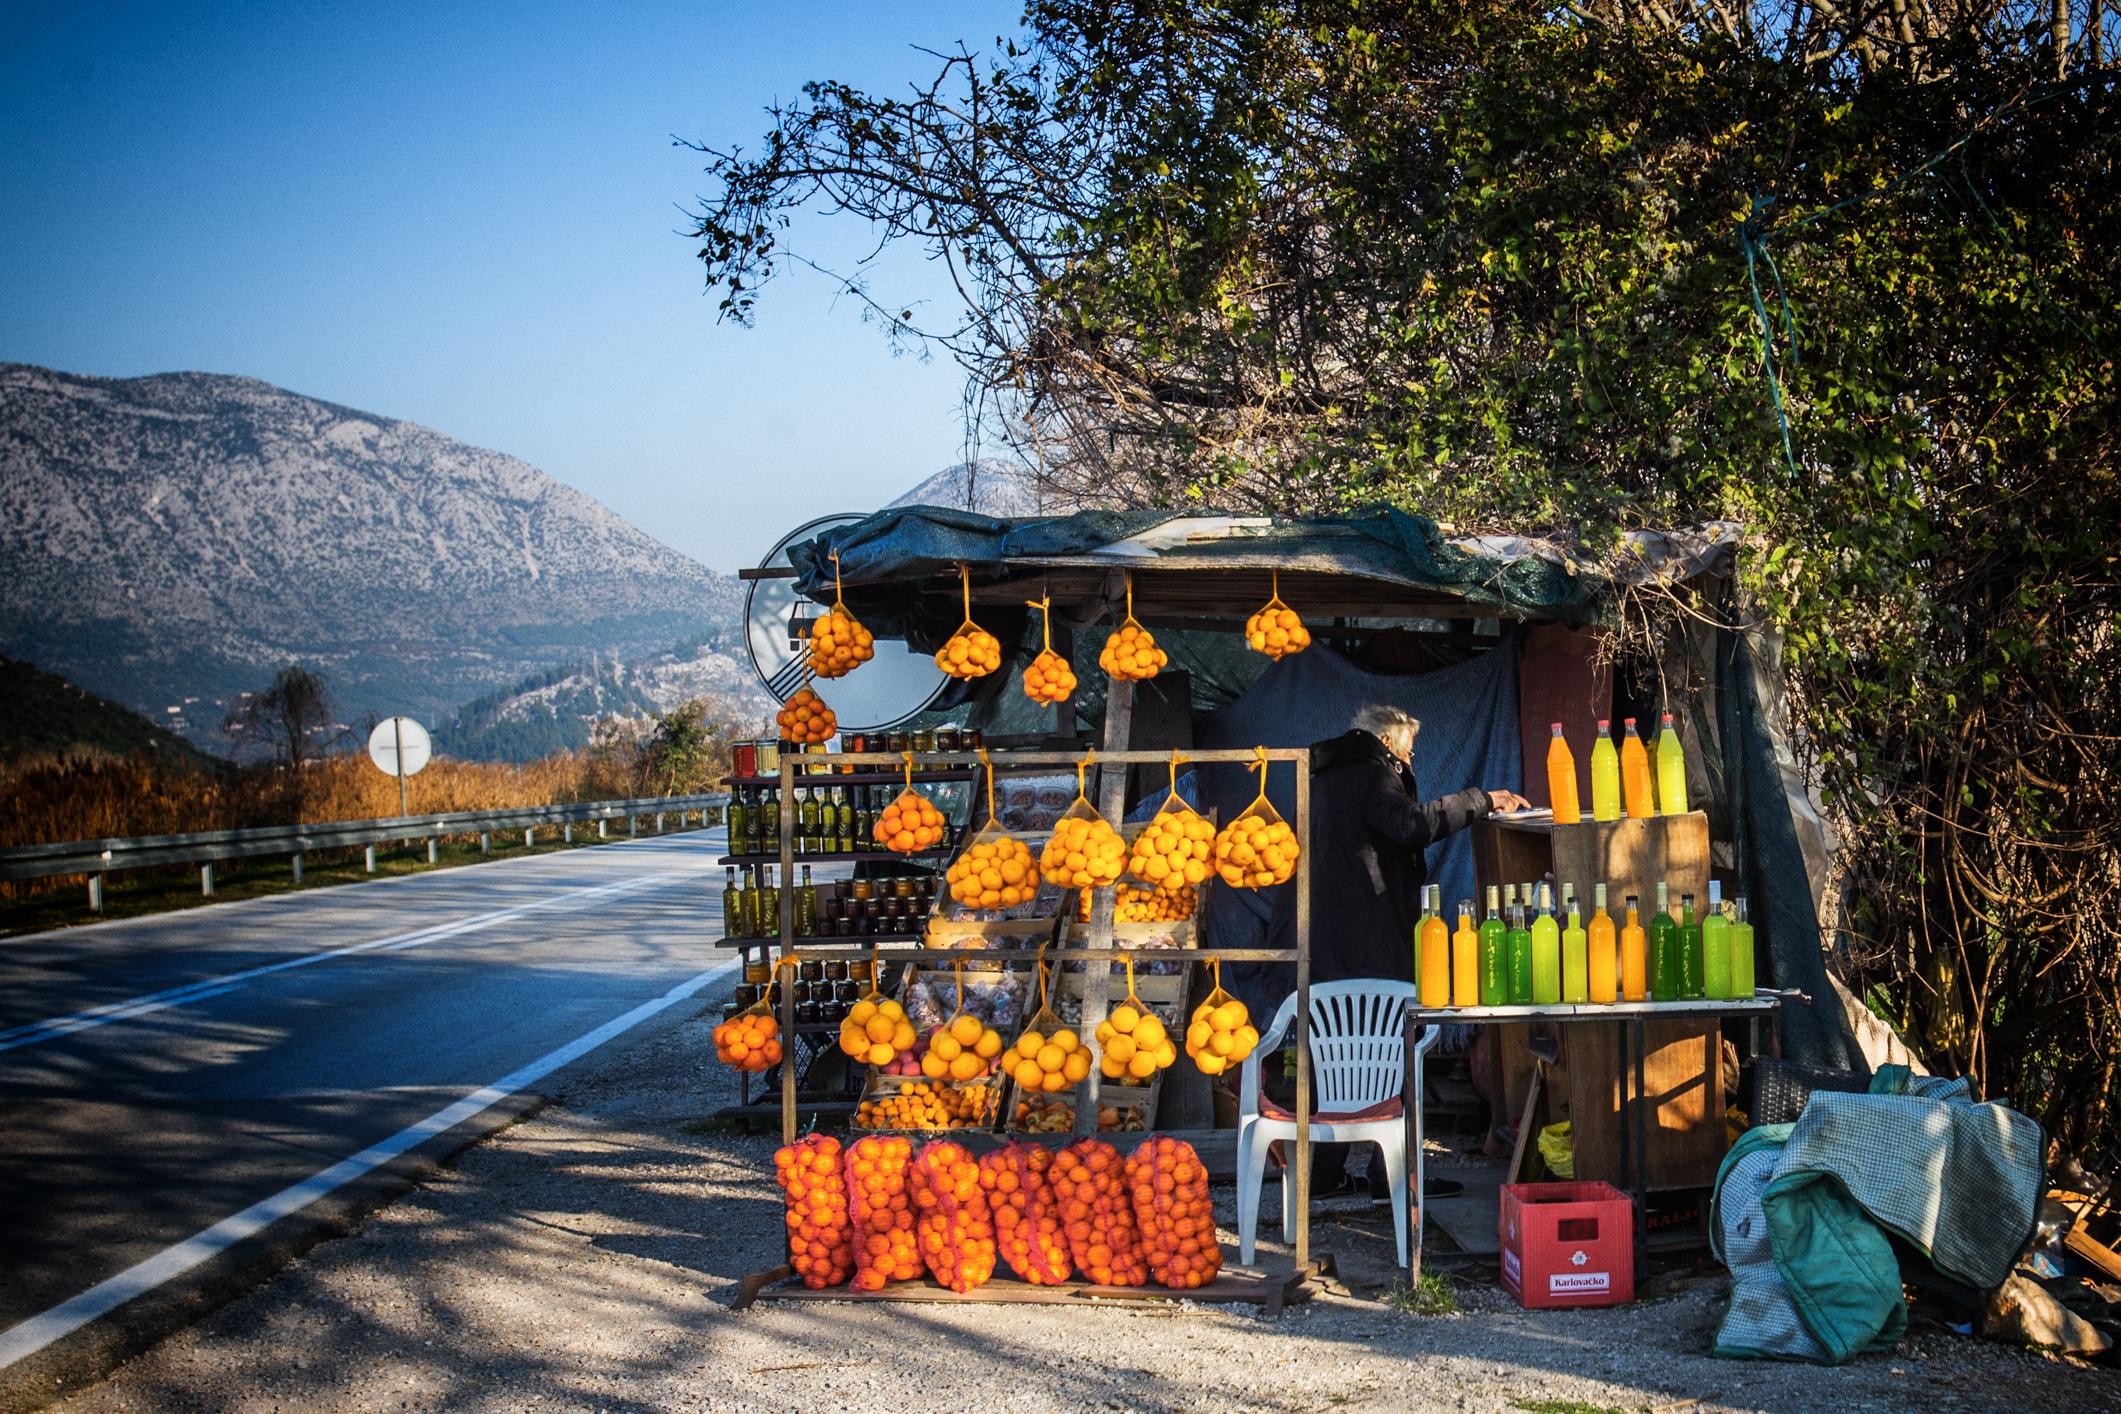 Roadside citrus farms on the way to Bosnia.